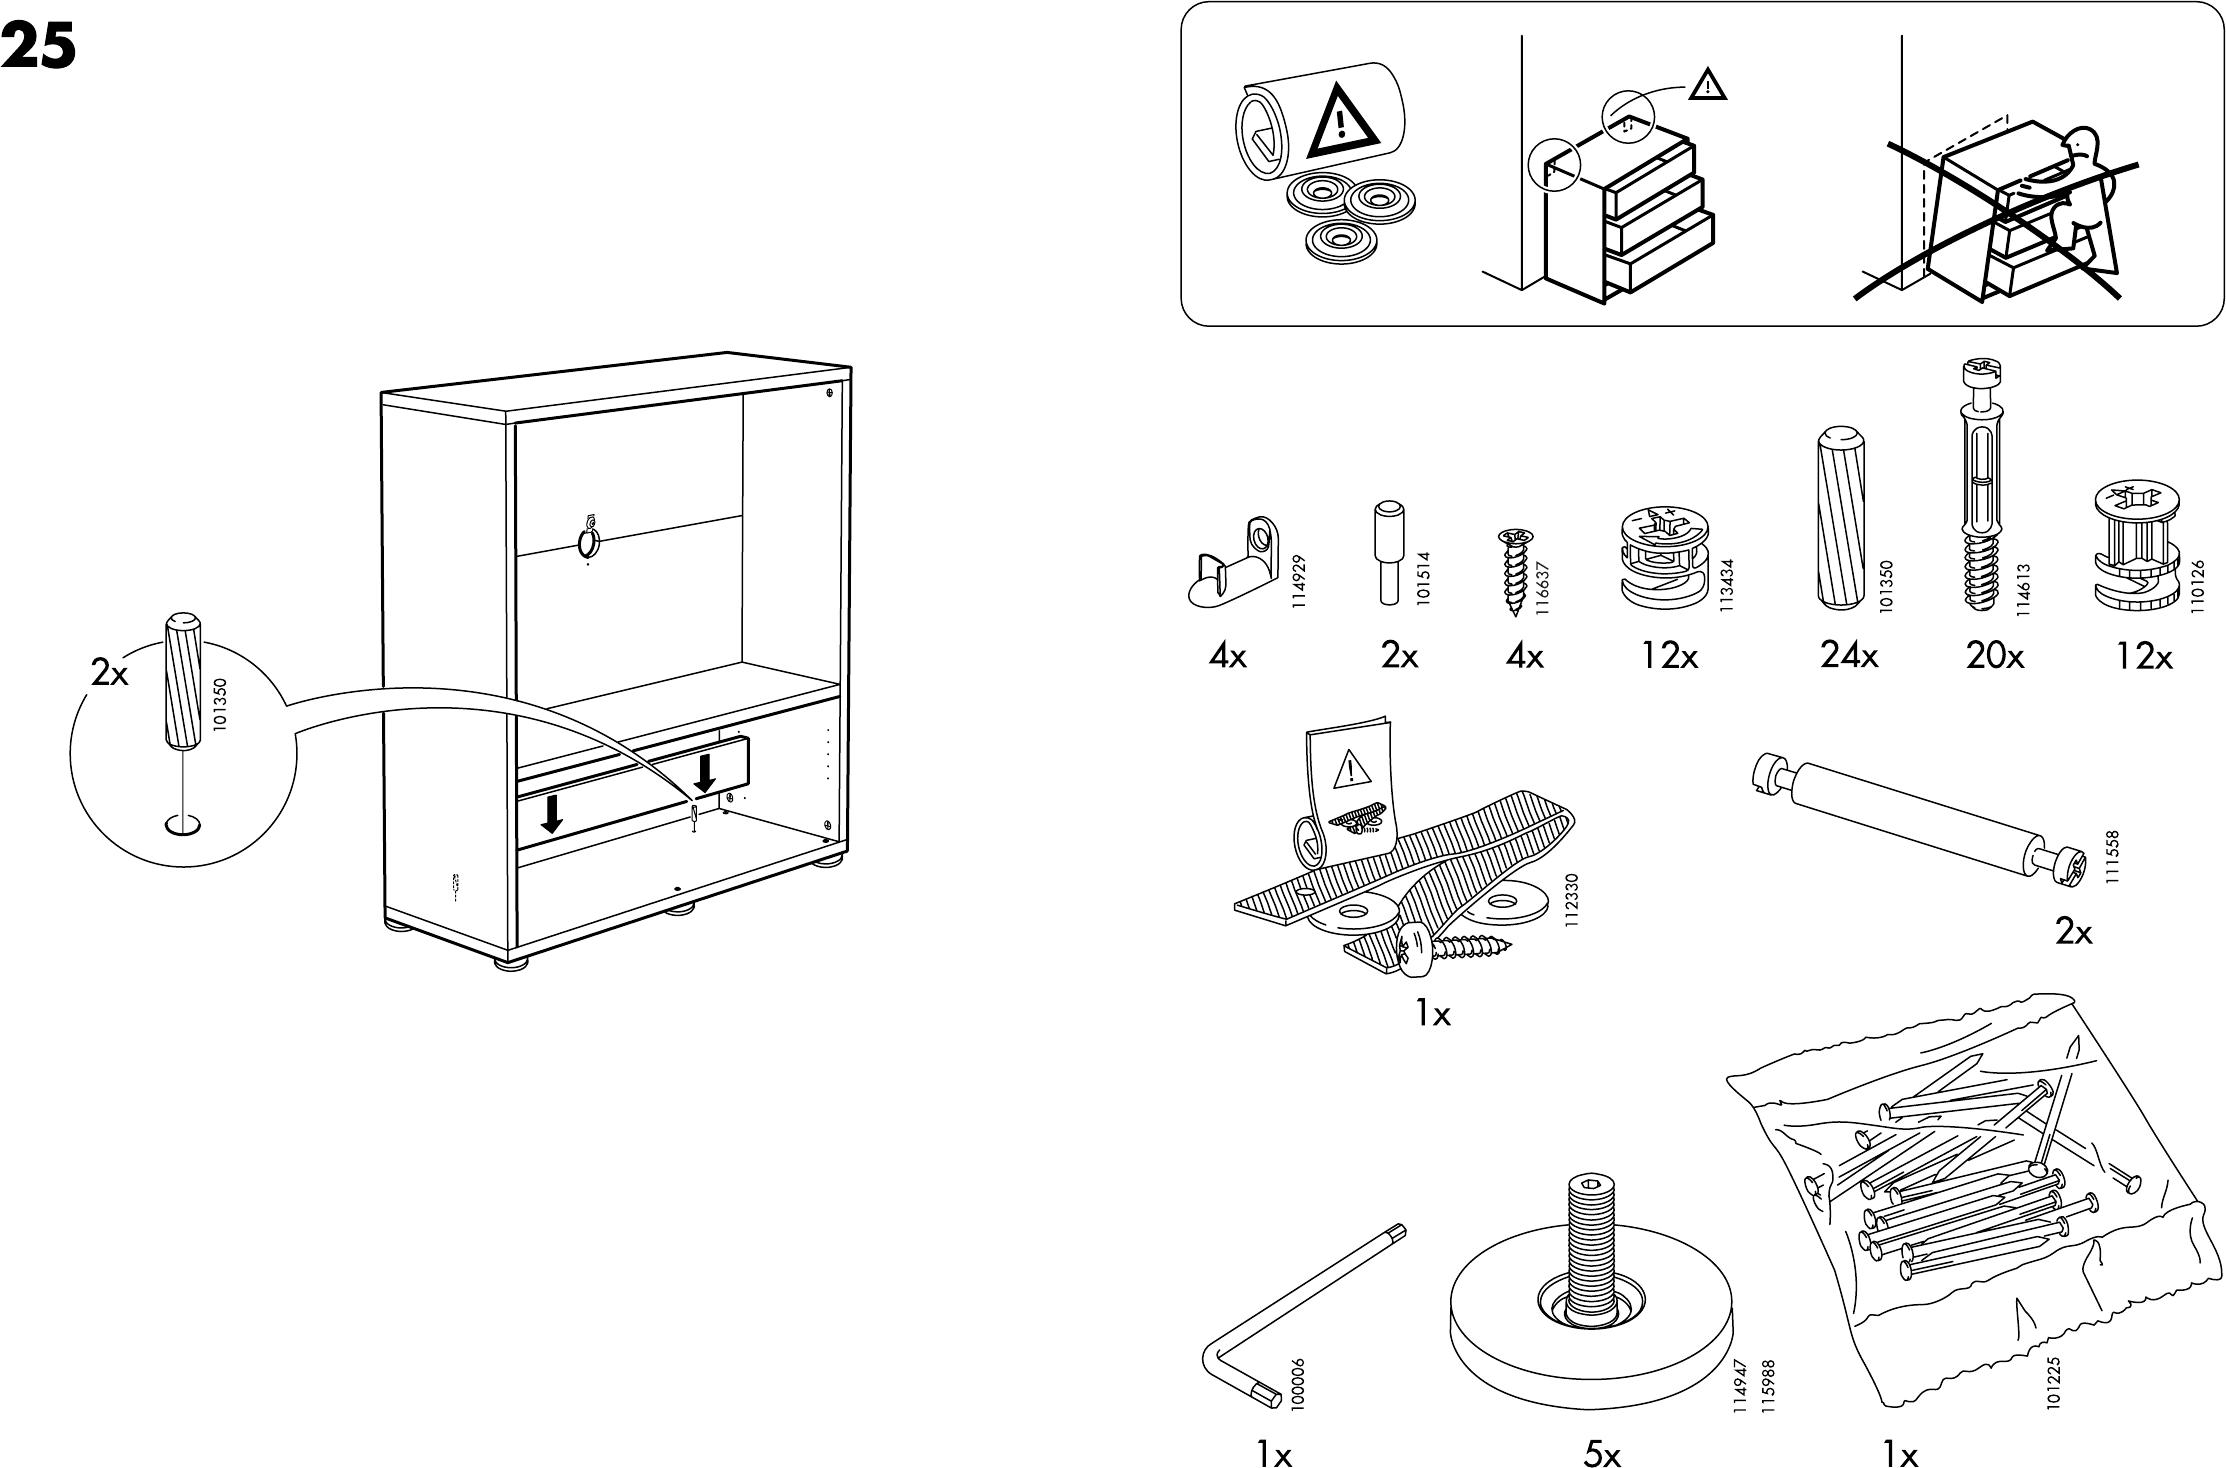 Handleiding Ikea Besta Enon Tv Kast Pagina 3 Van 10 Dansk